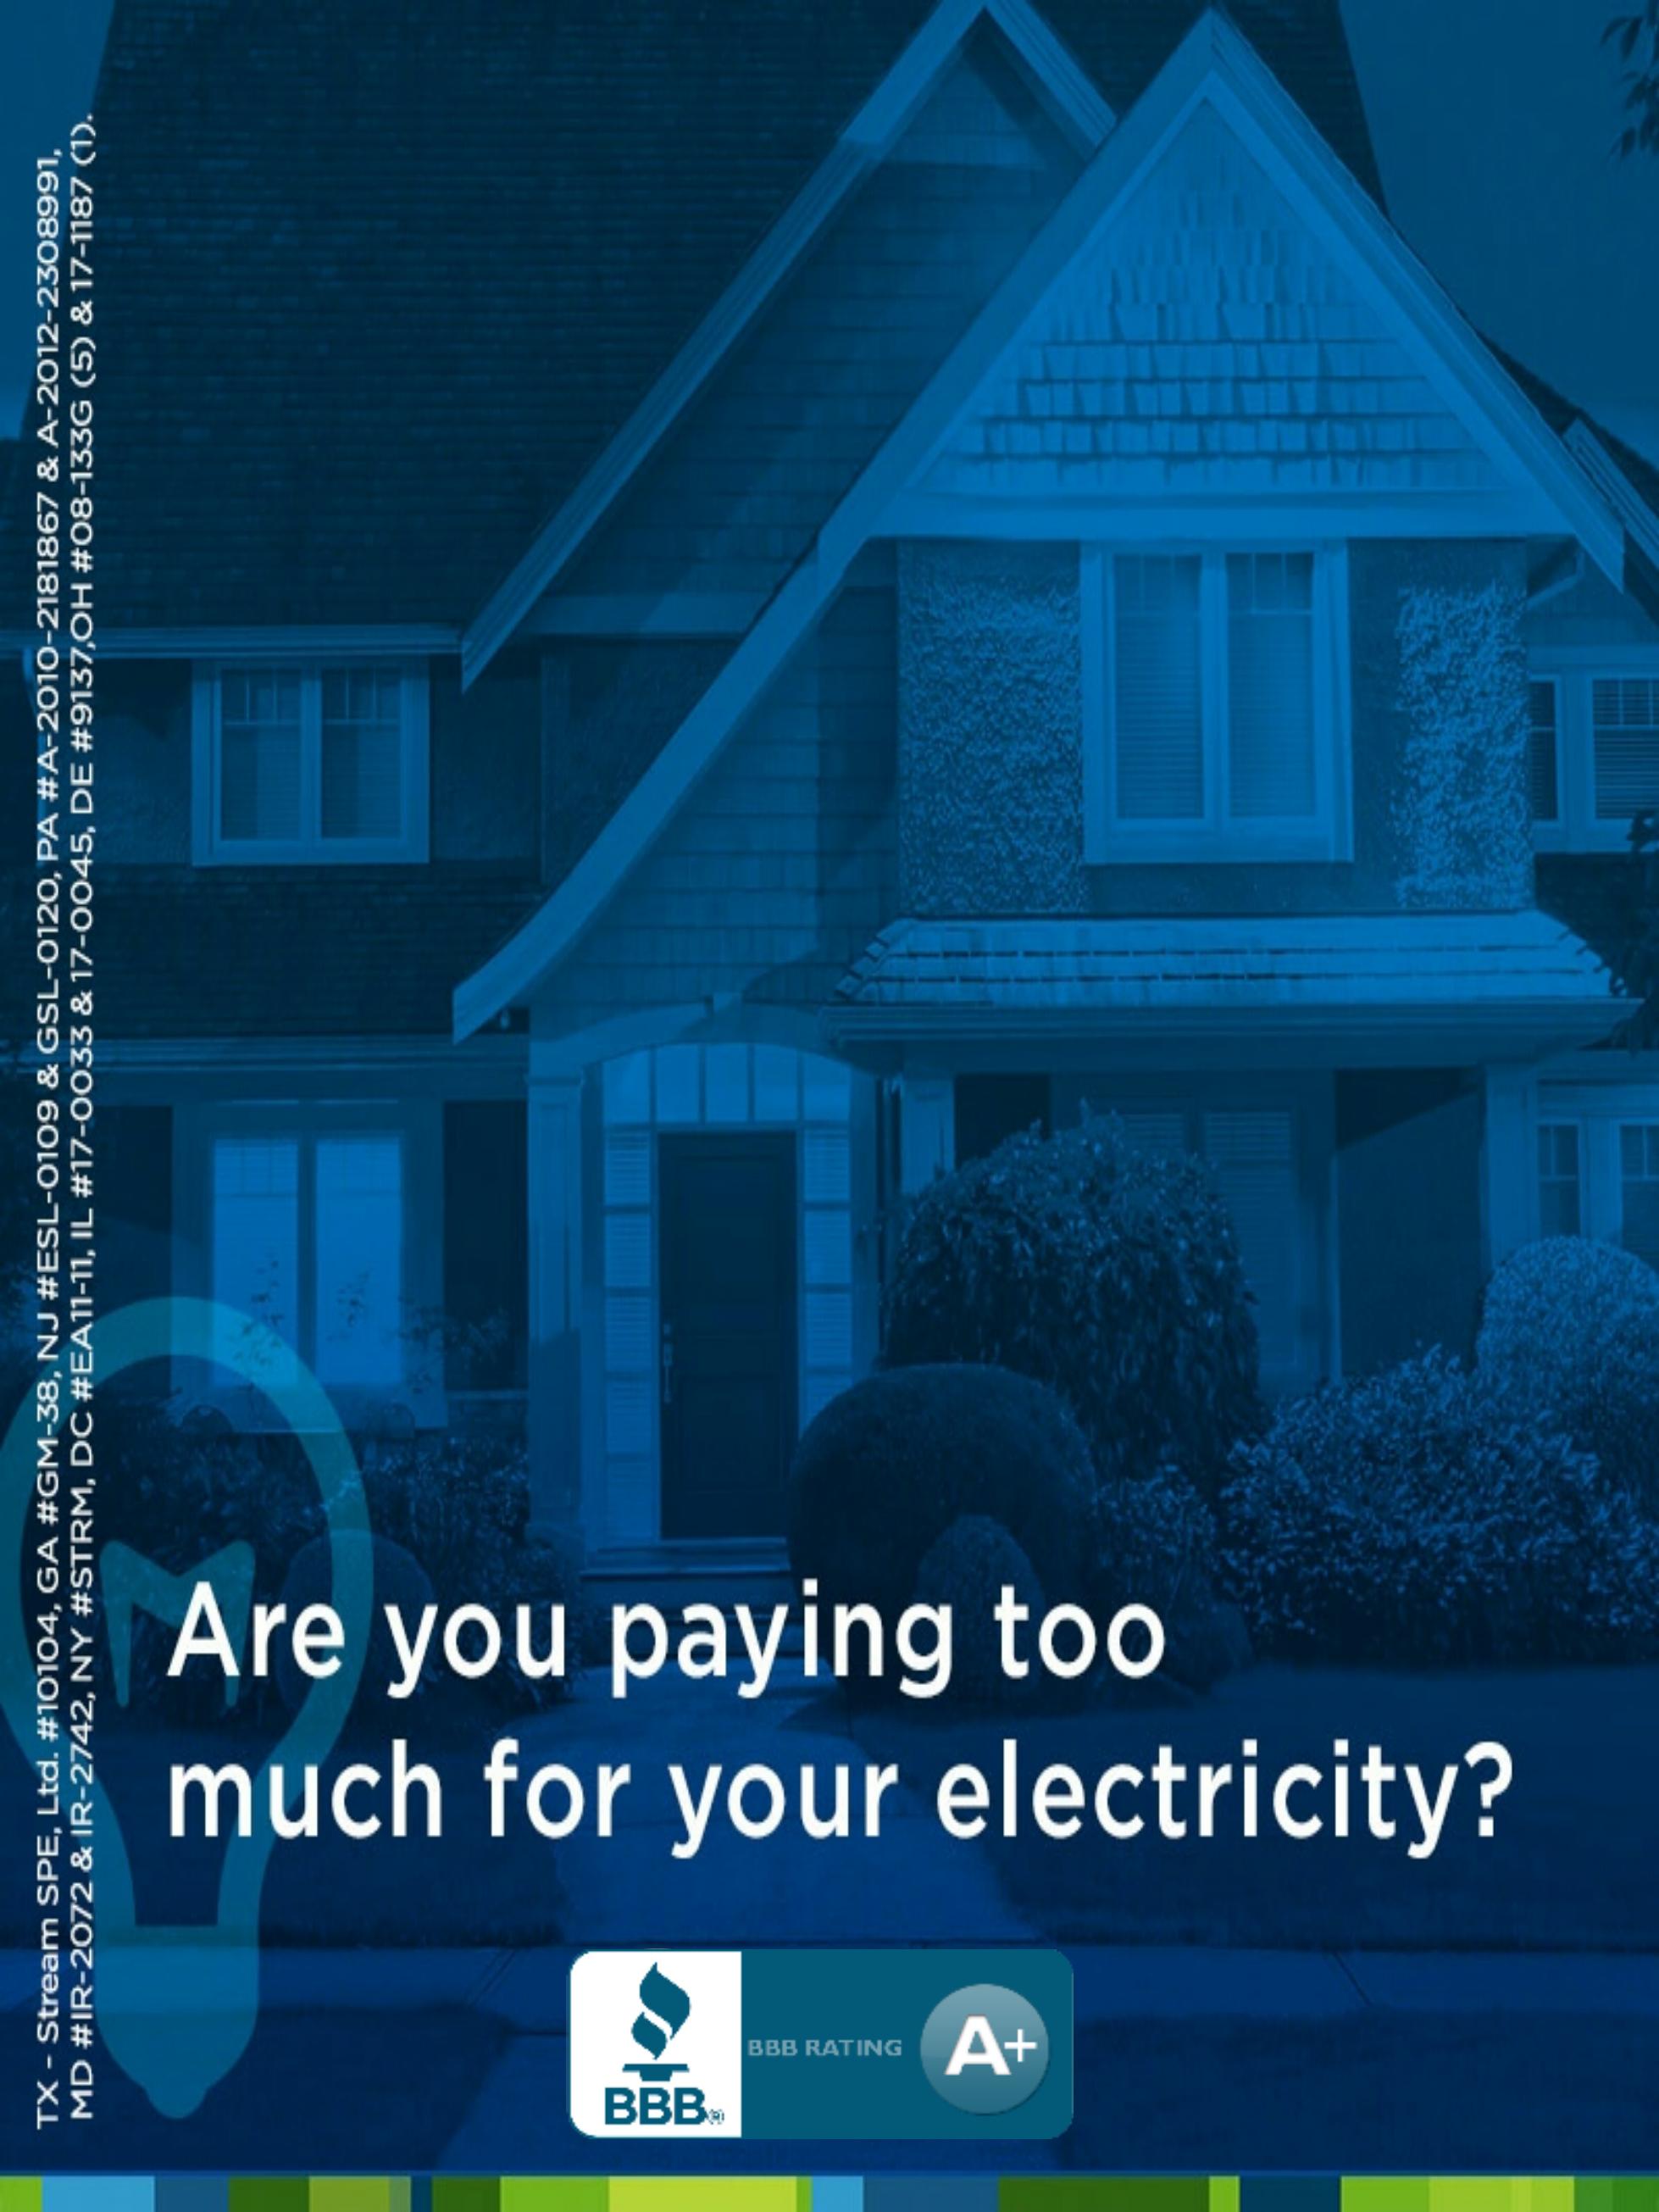 Goodbye, unpredictable energy bills. HELLO, SIMPLE BUDGETING!